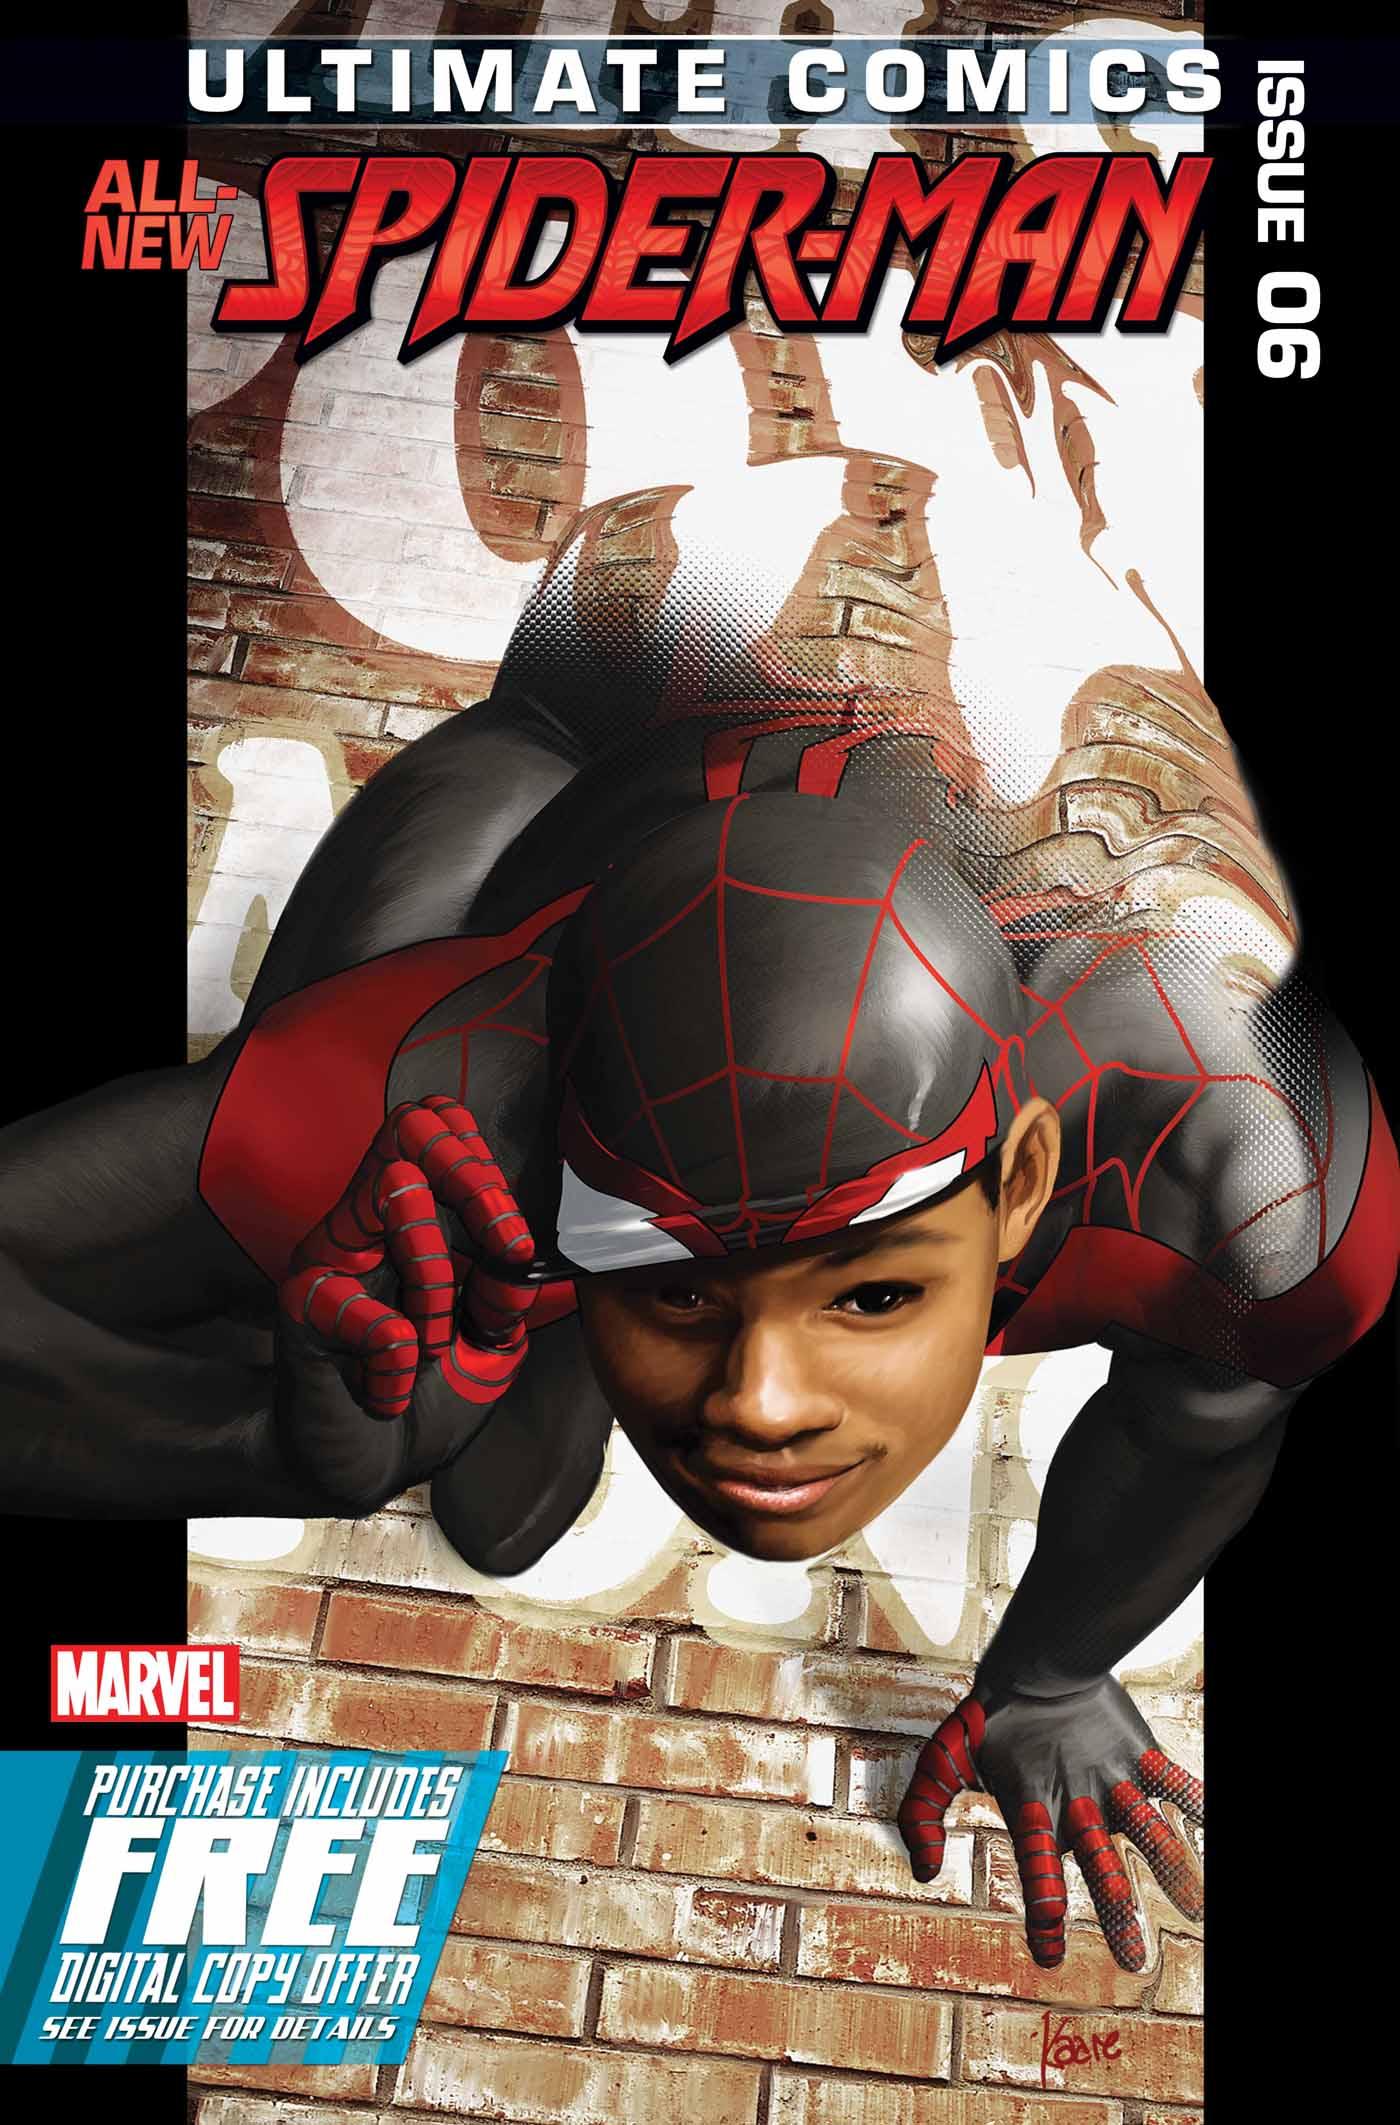 Ultimate comics to offer free digital downloads in 2012 - Marvel spiderman comics pdf ...